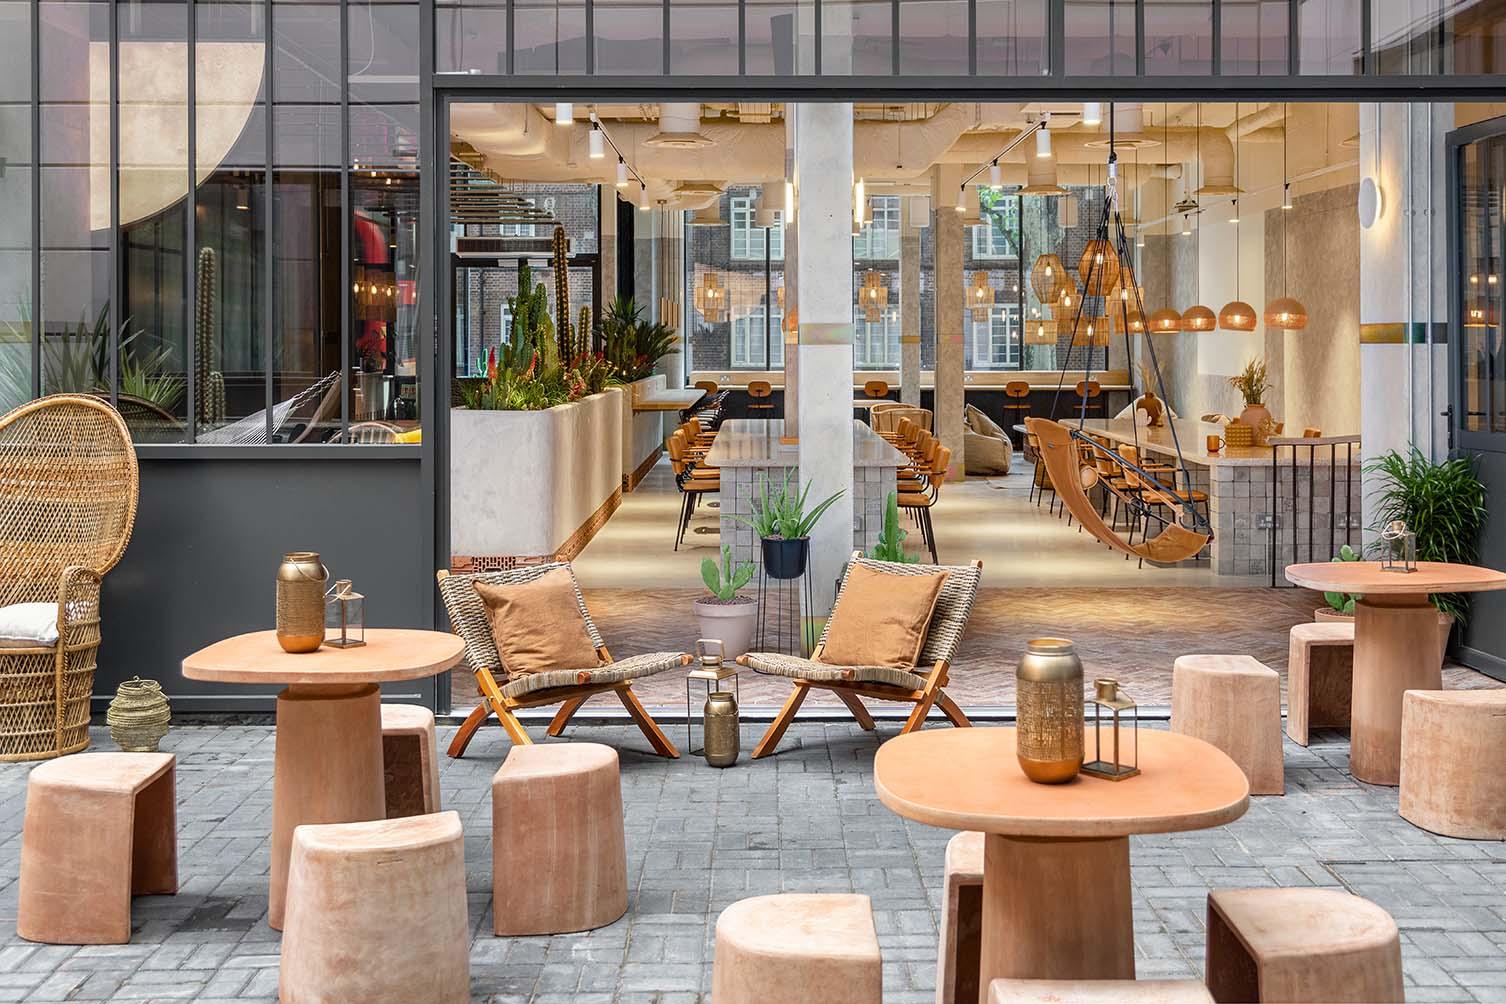 Bermonds Locke London, Tower Bridge Bermondsey Design Hotel by Holloway Li